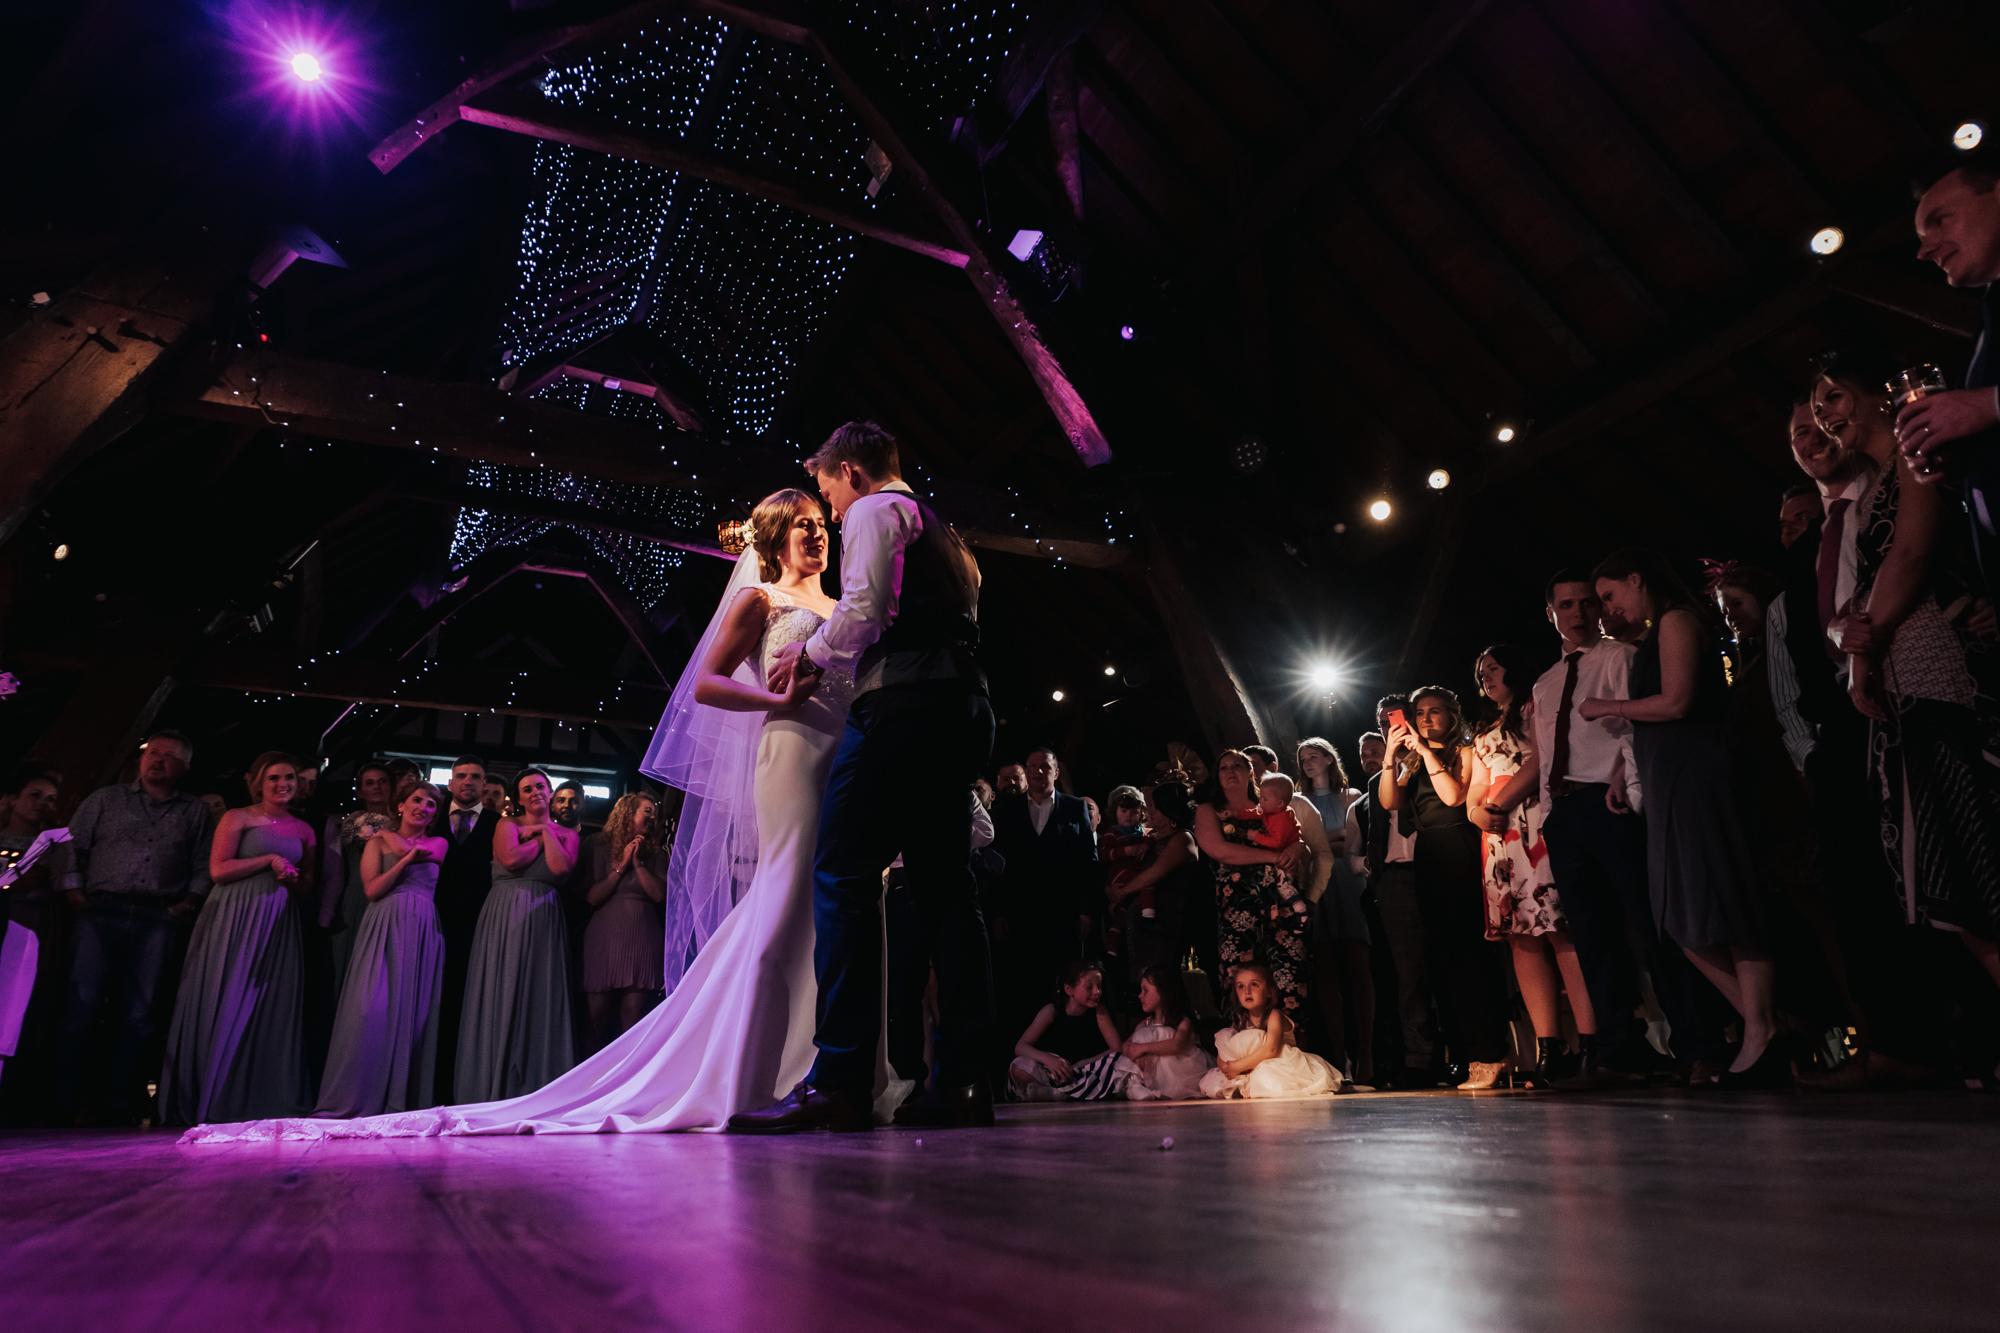 Rivington Hall Barn Wedding Photography lancashire wedding photographer (39 of 45).jpg